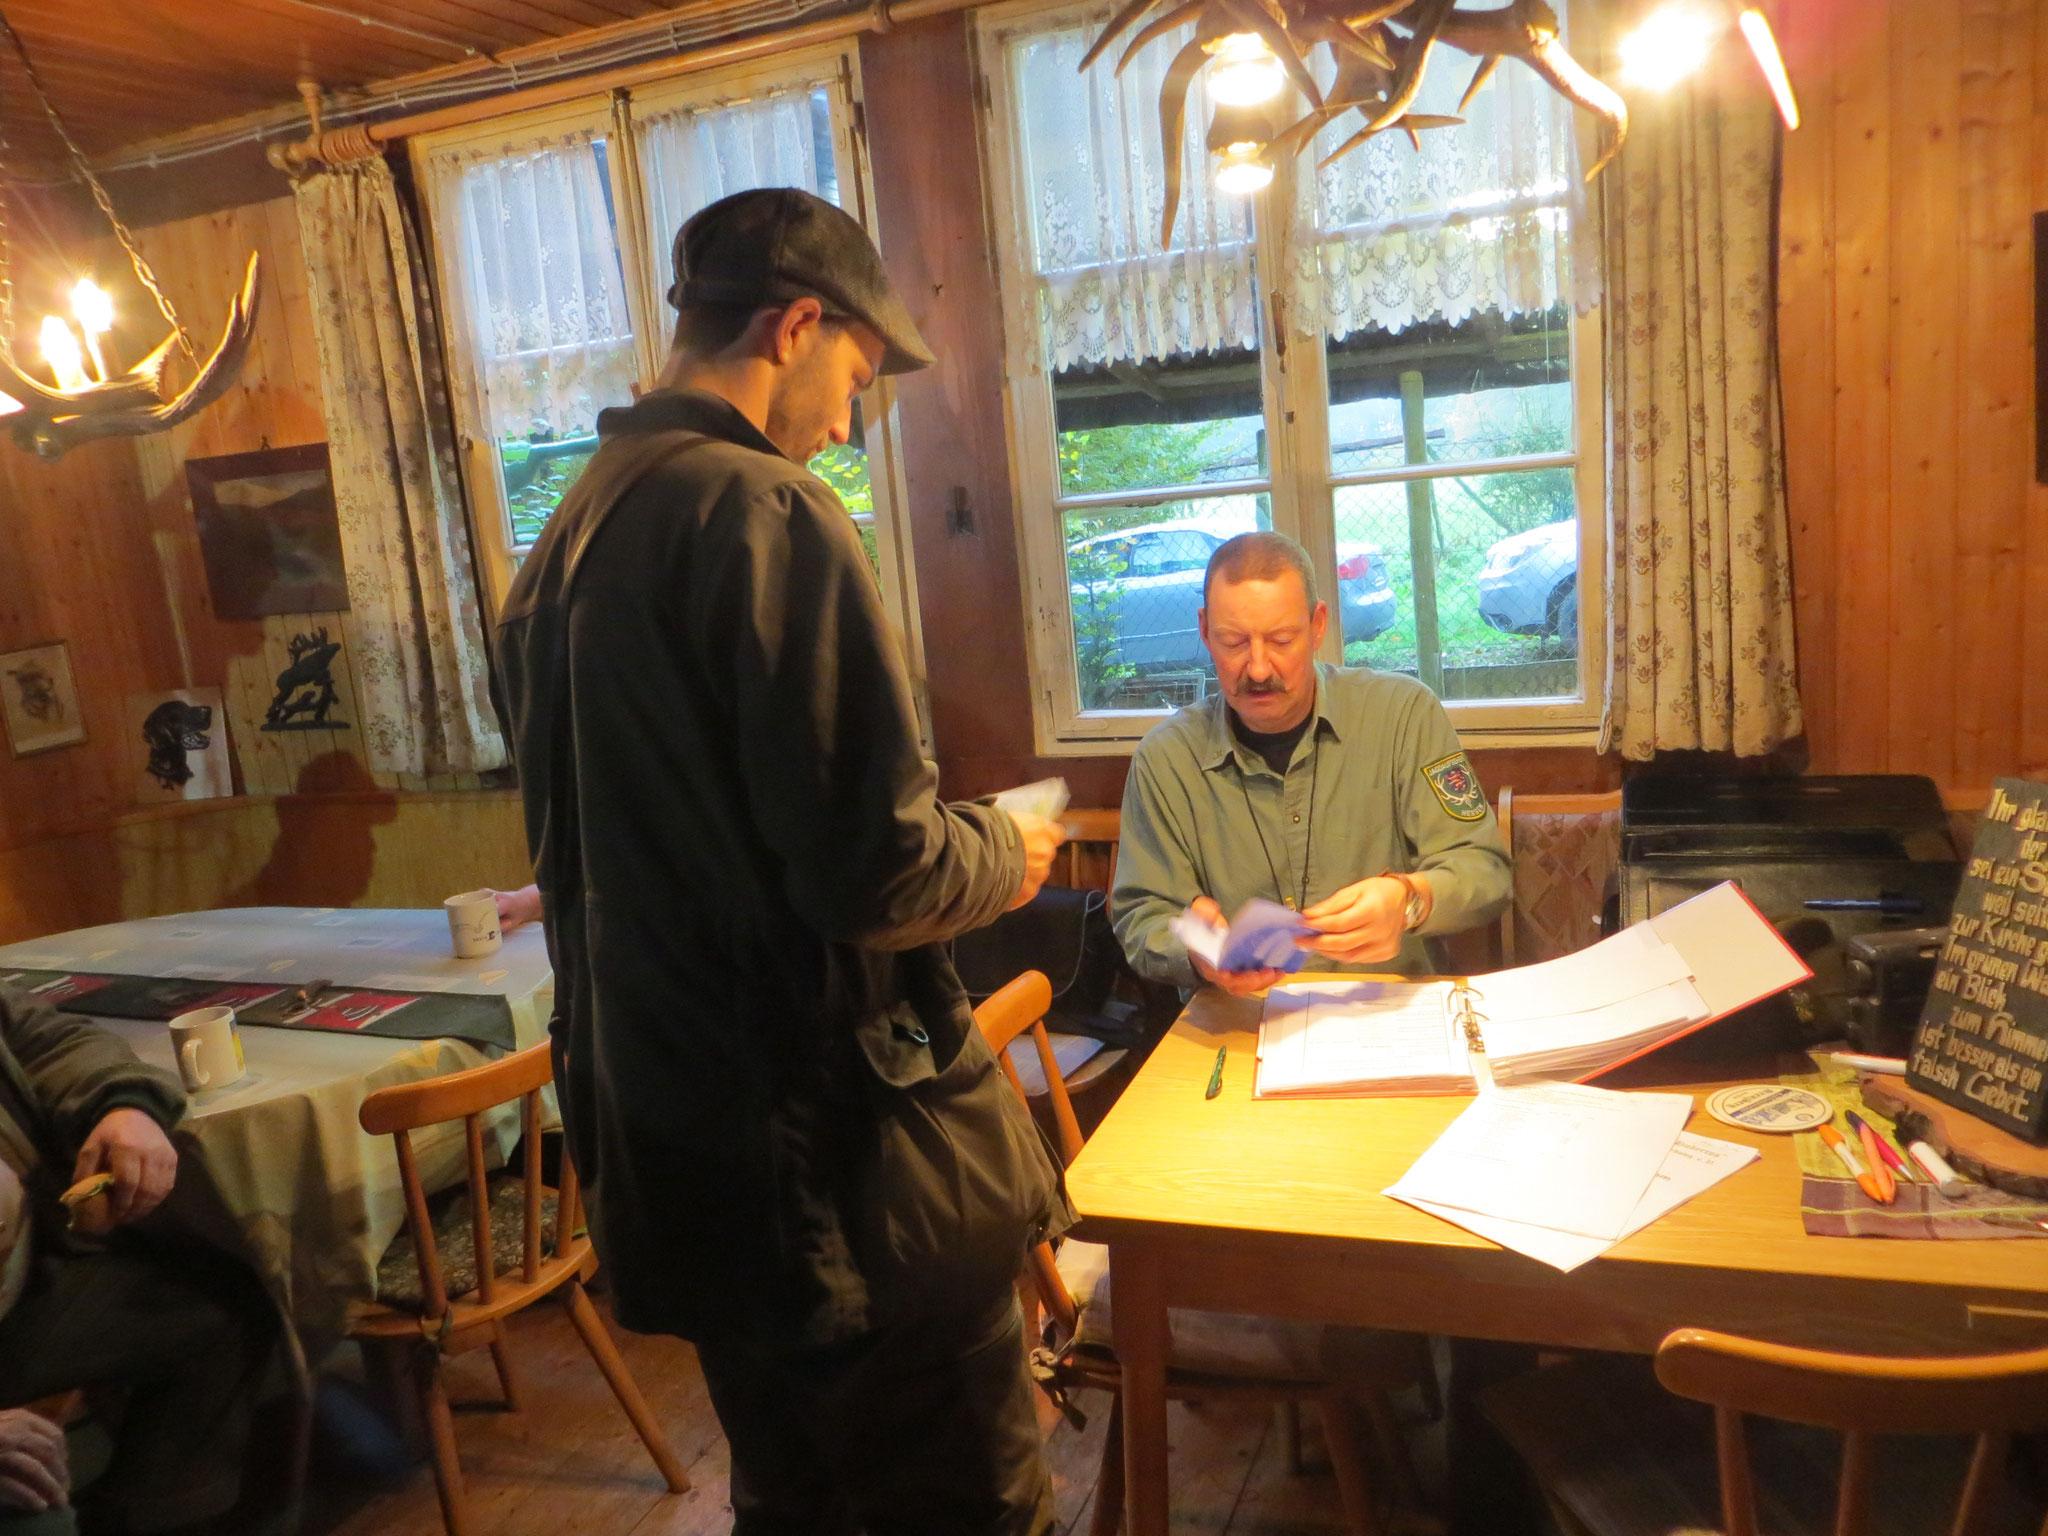 Prüfungsleiter Andreas Deeg überprüft die Papiere.